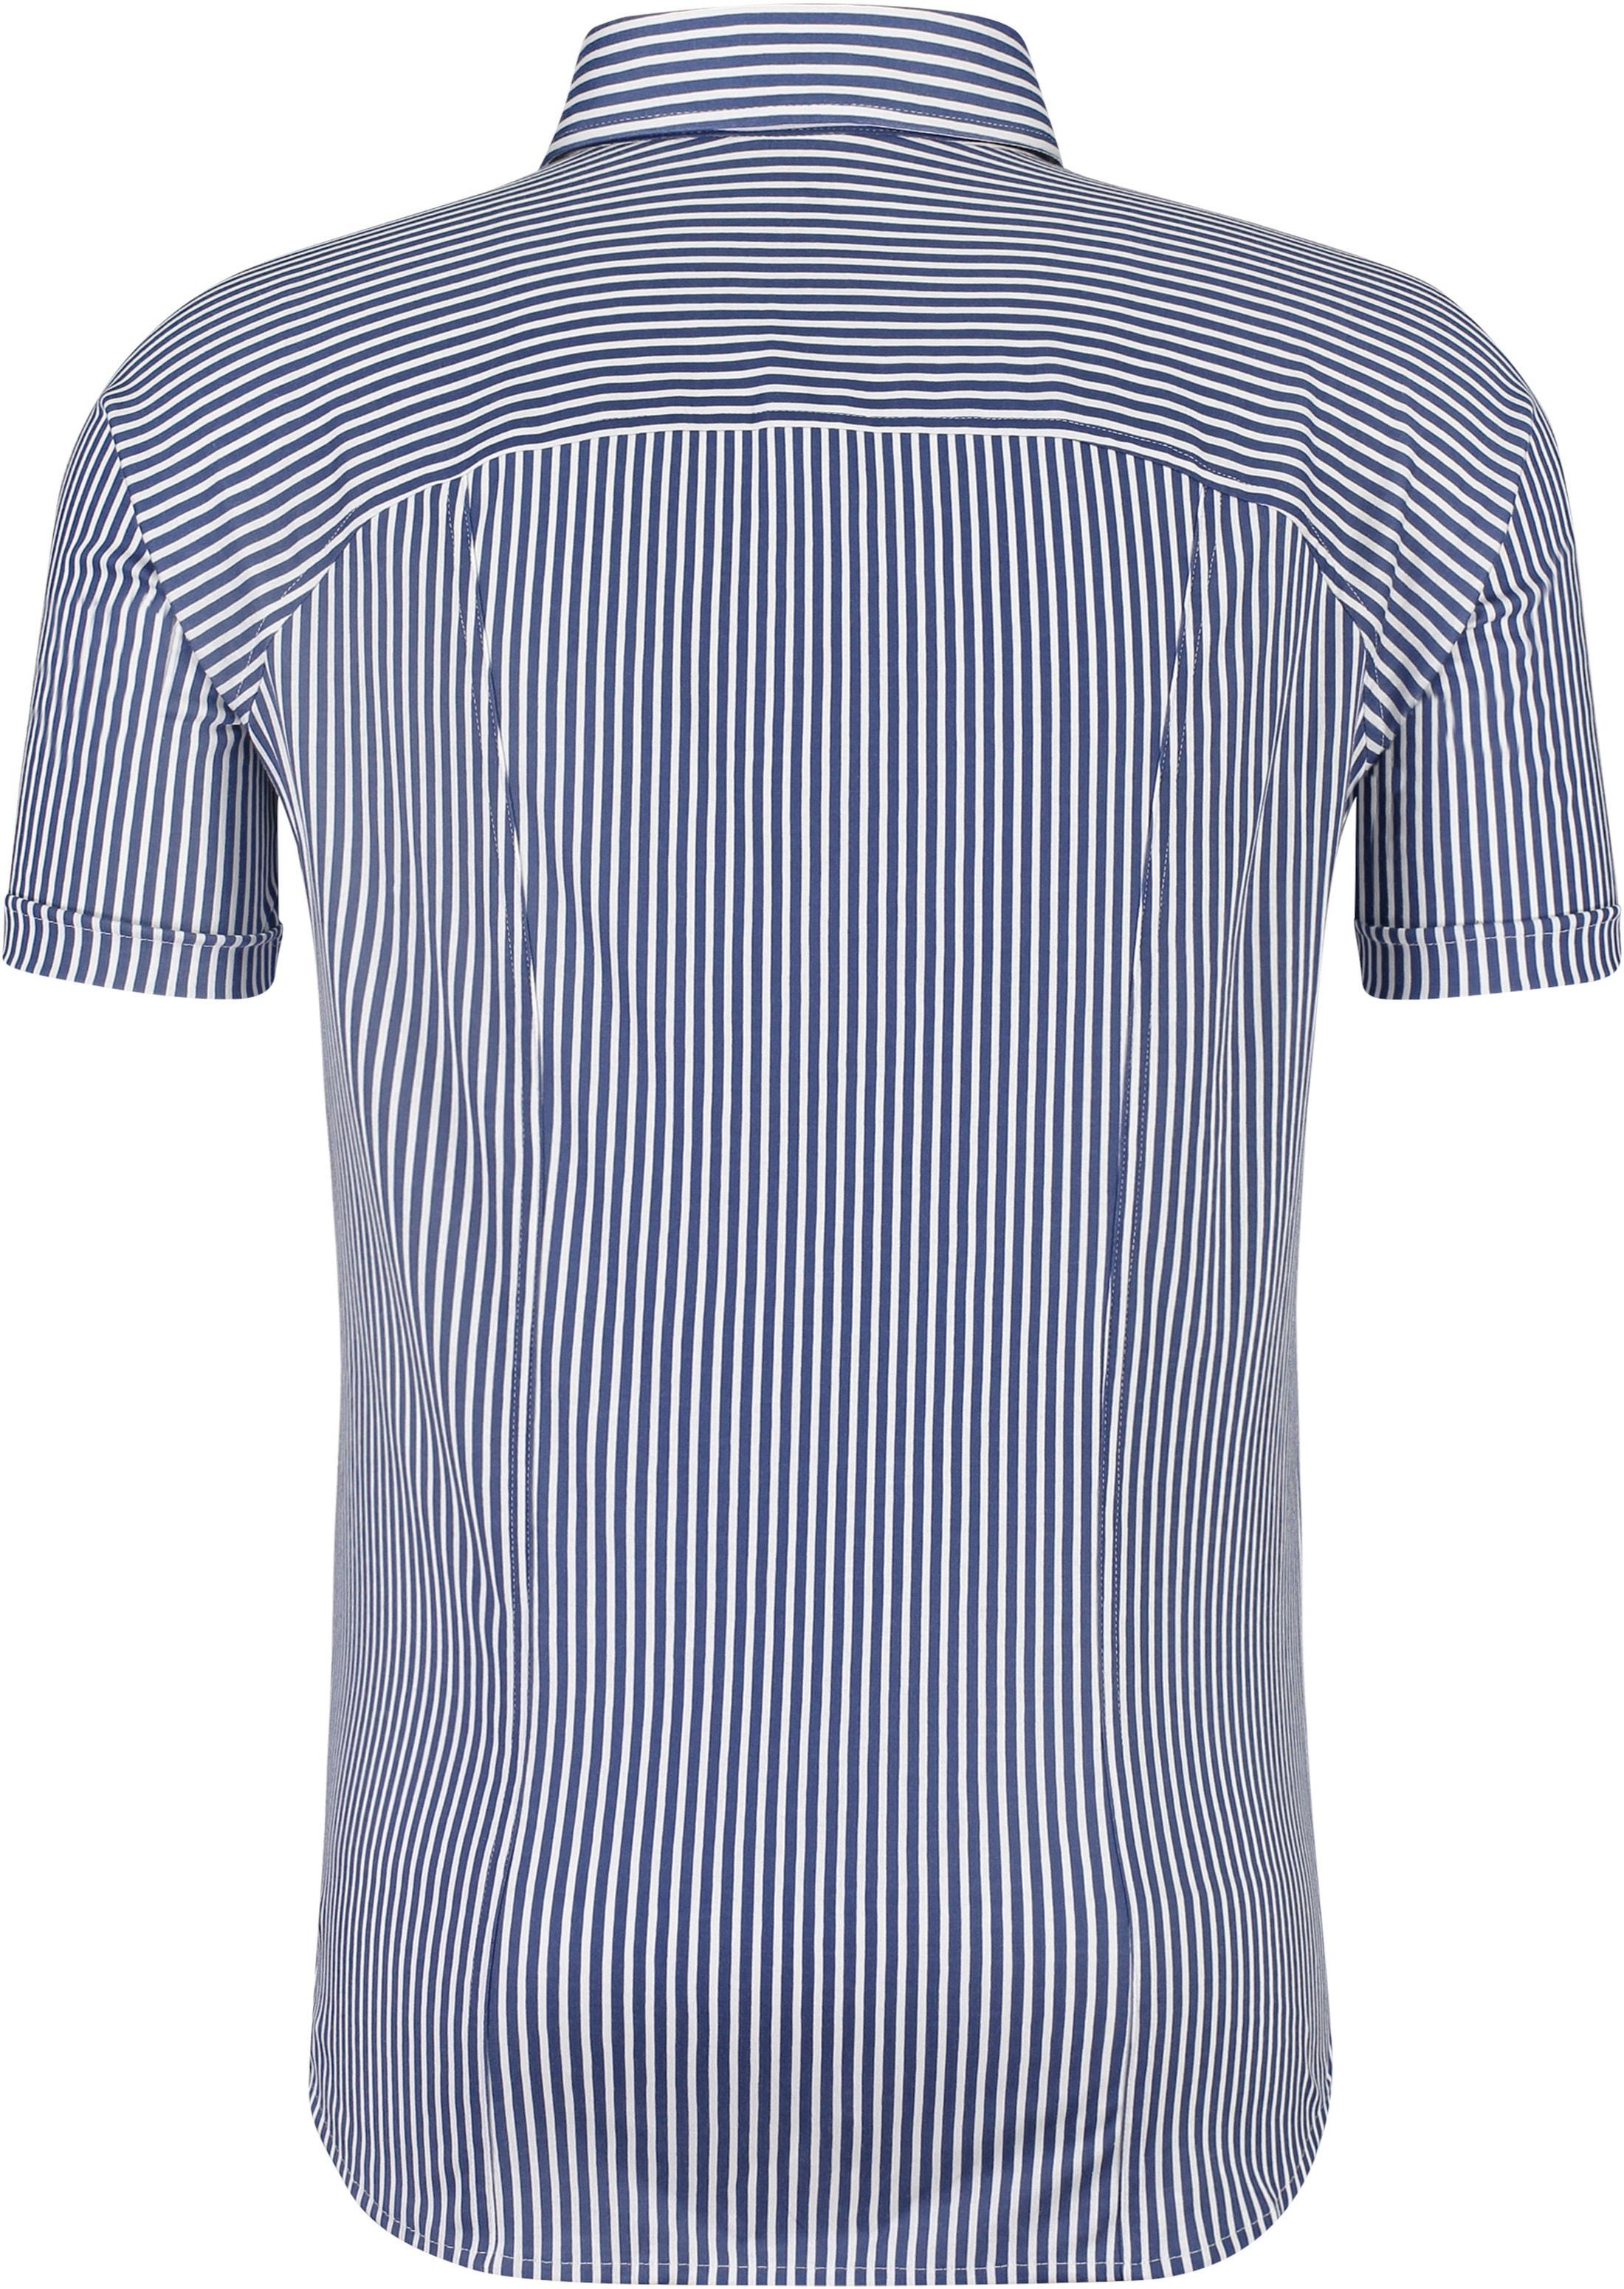 Desoto Overhemd Korte Mouw Streep Navy foto 1